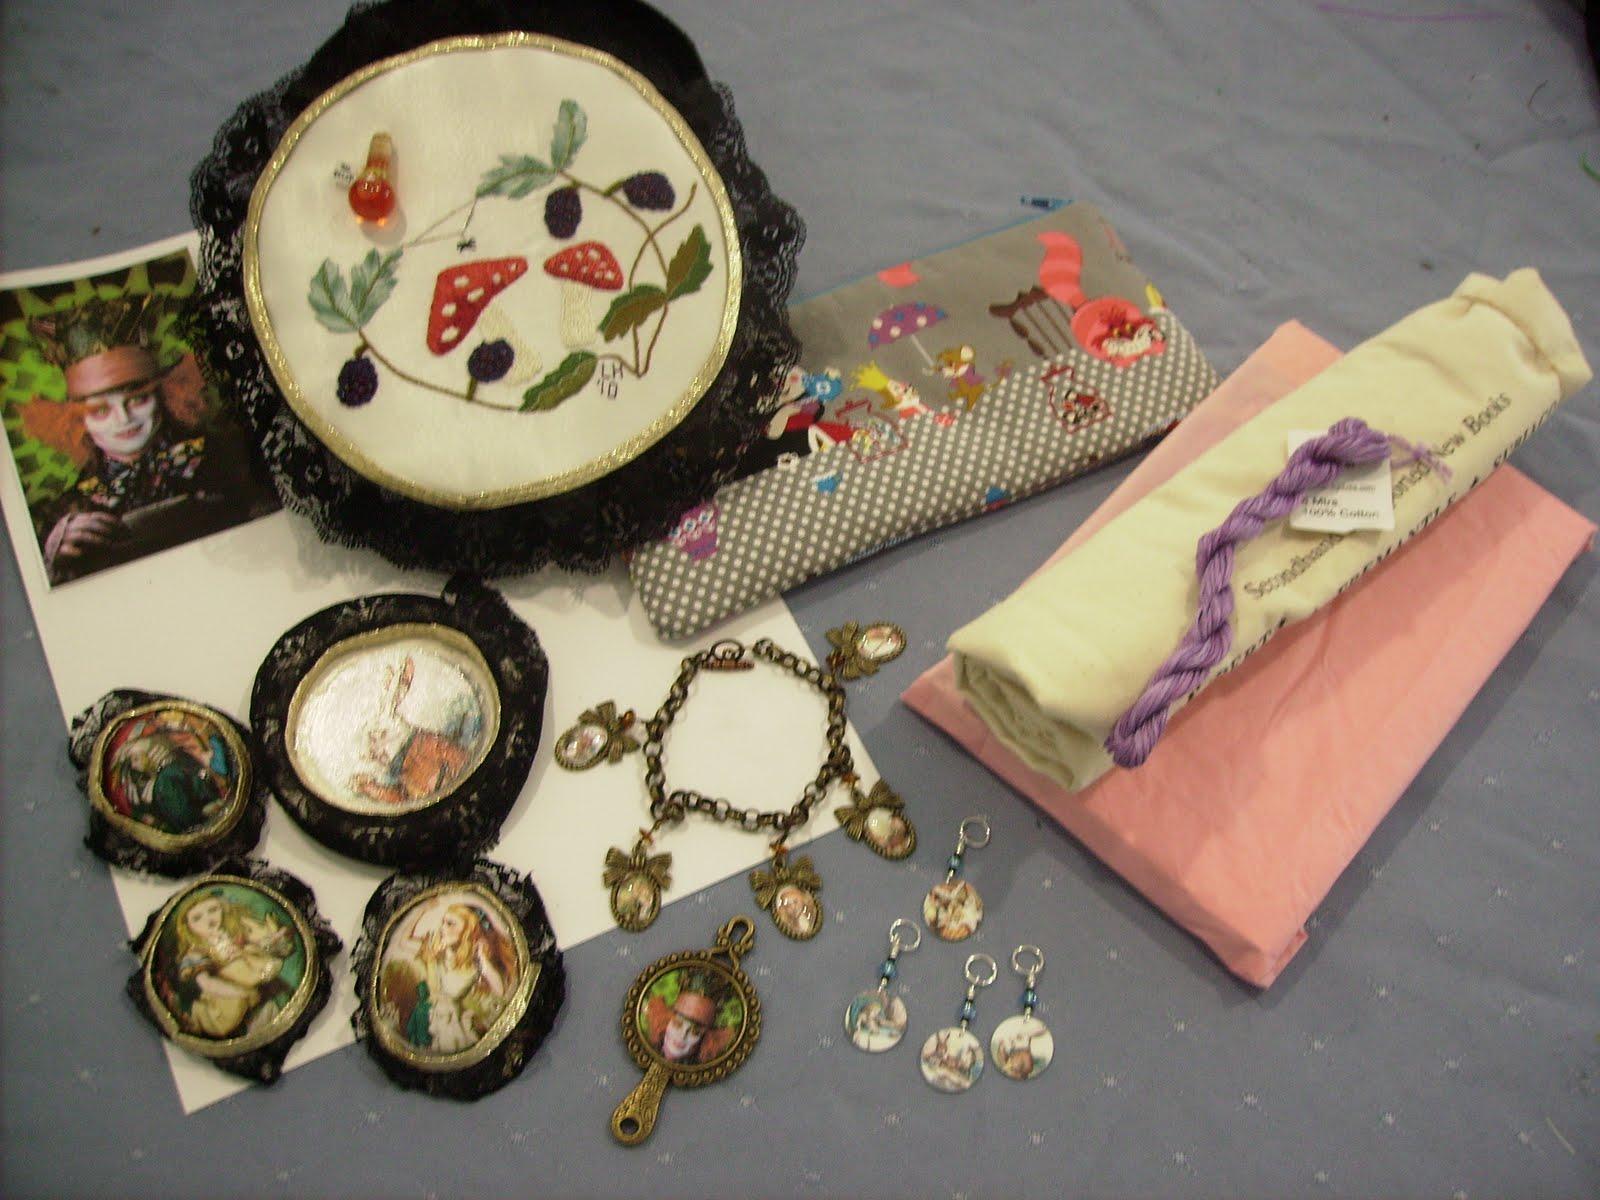 Lisa 39 s lair alice in wonderland inspired crafts for Alice in wonderland crafts